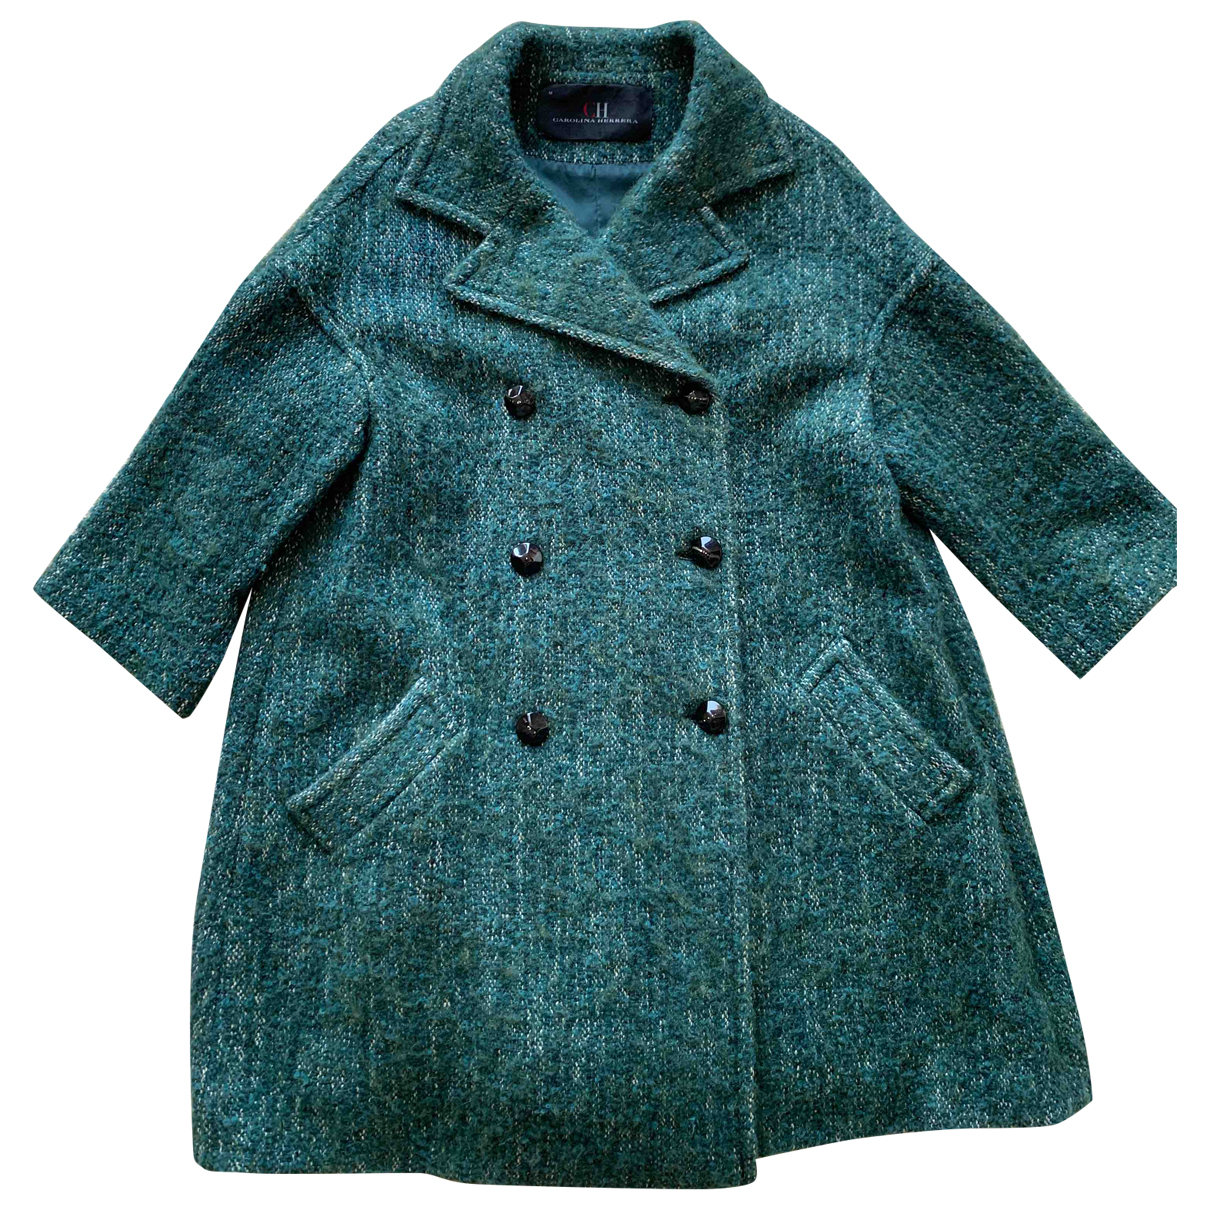 Carolina Herrera - Manteau   pour femme en laine - vert